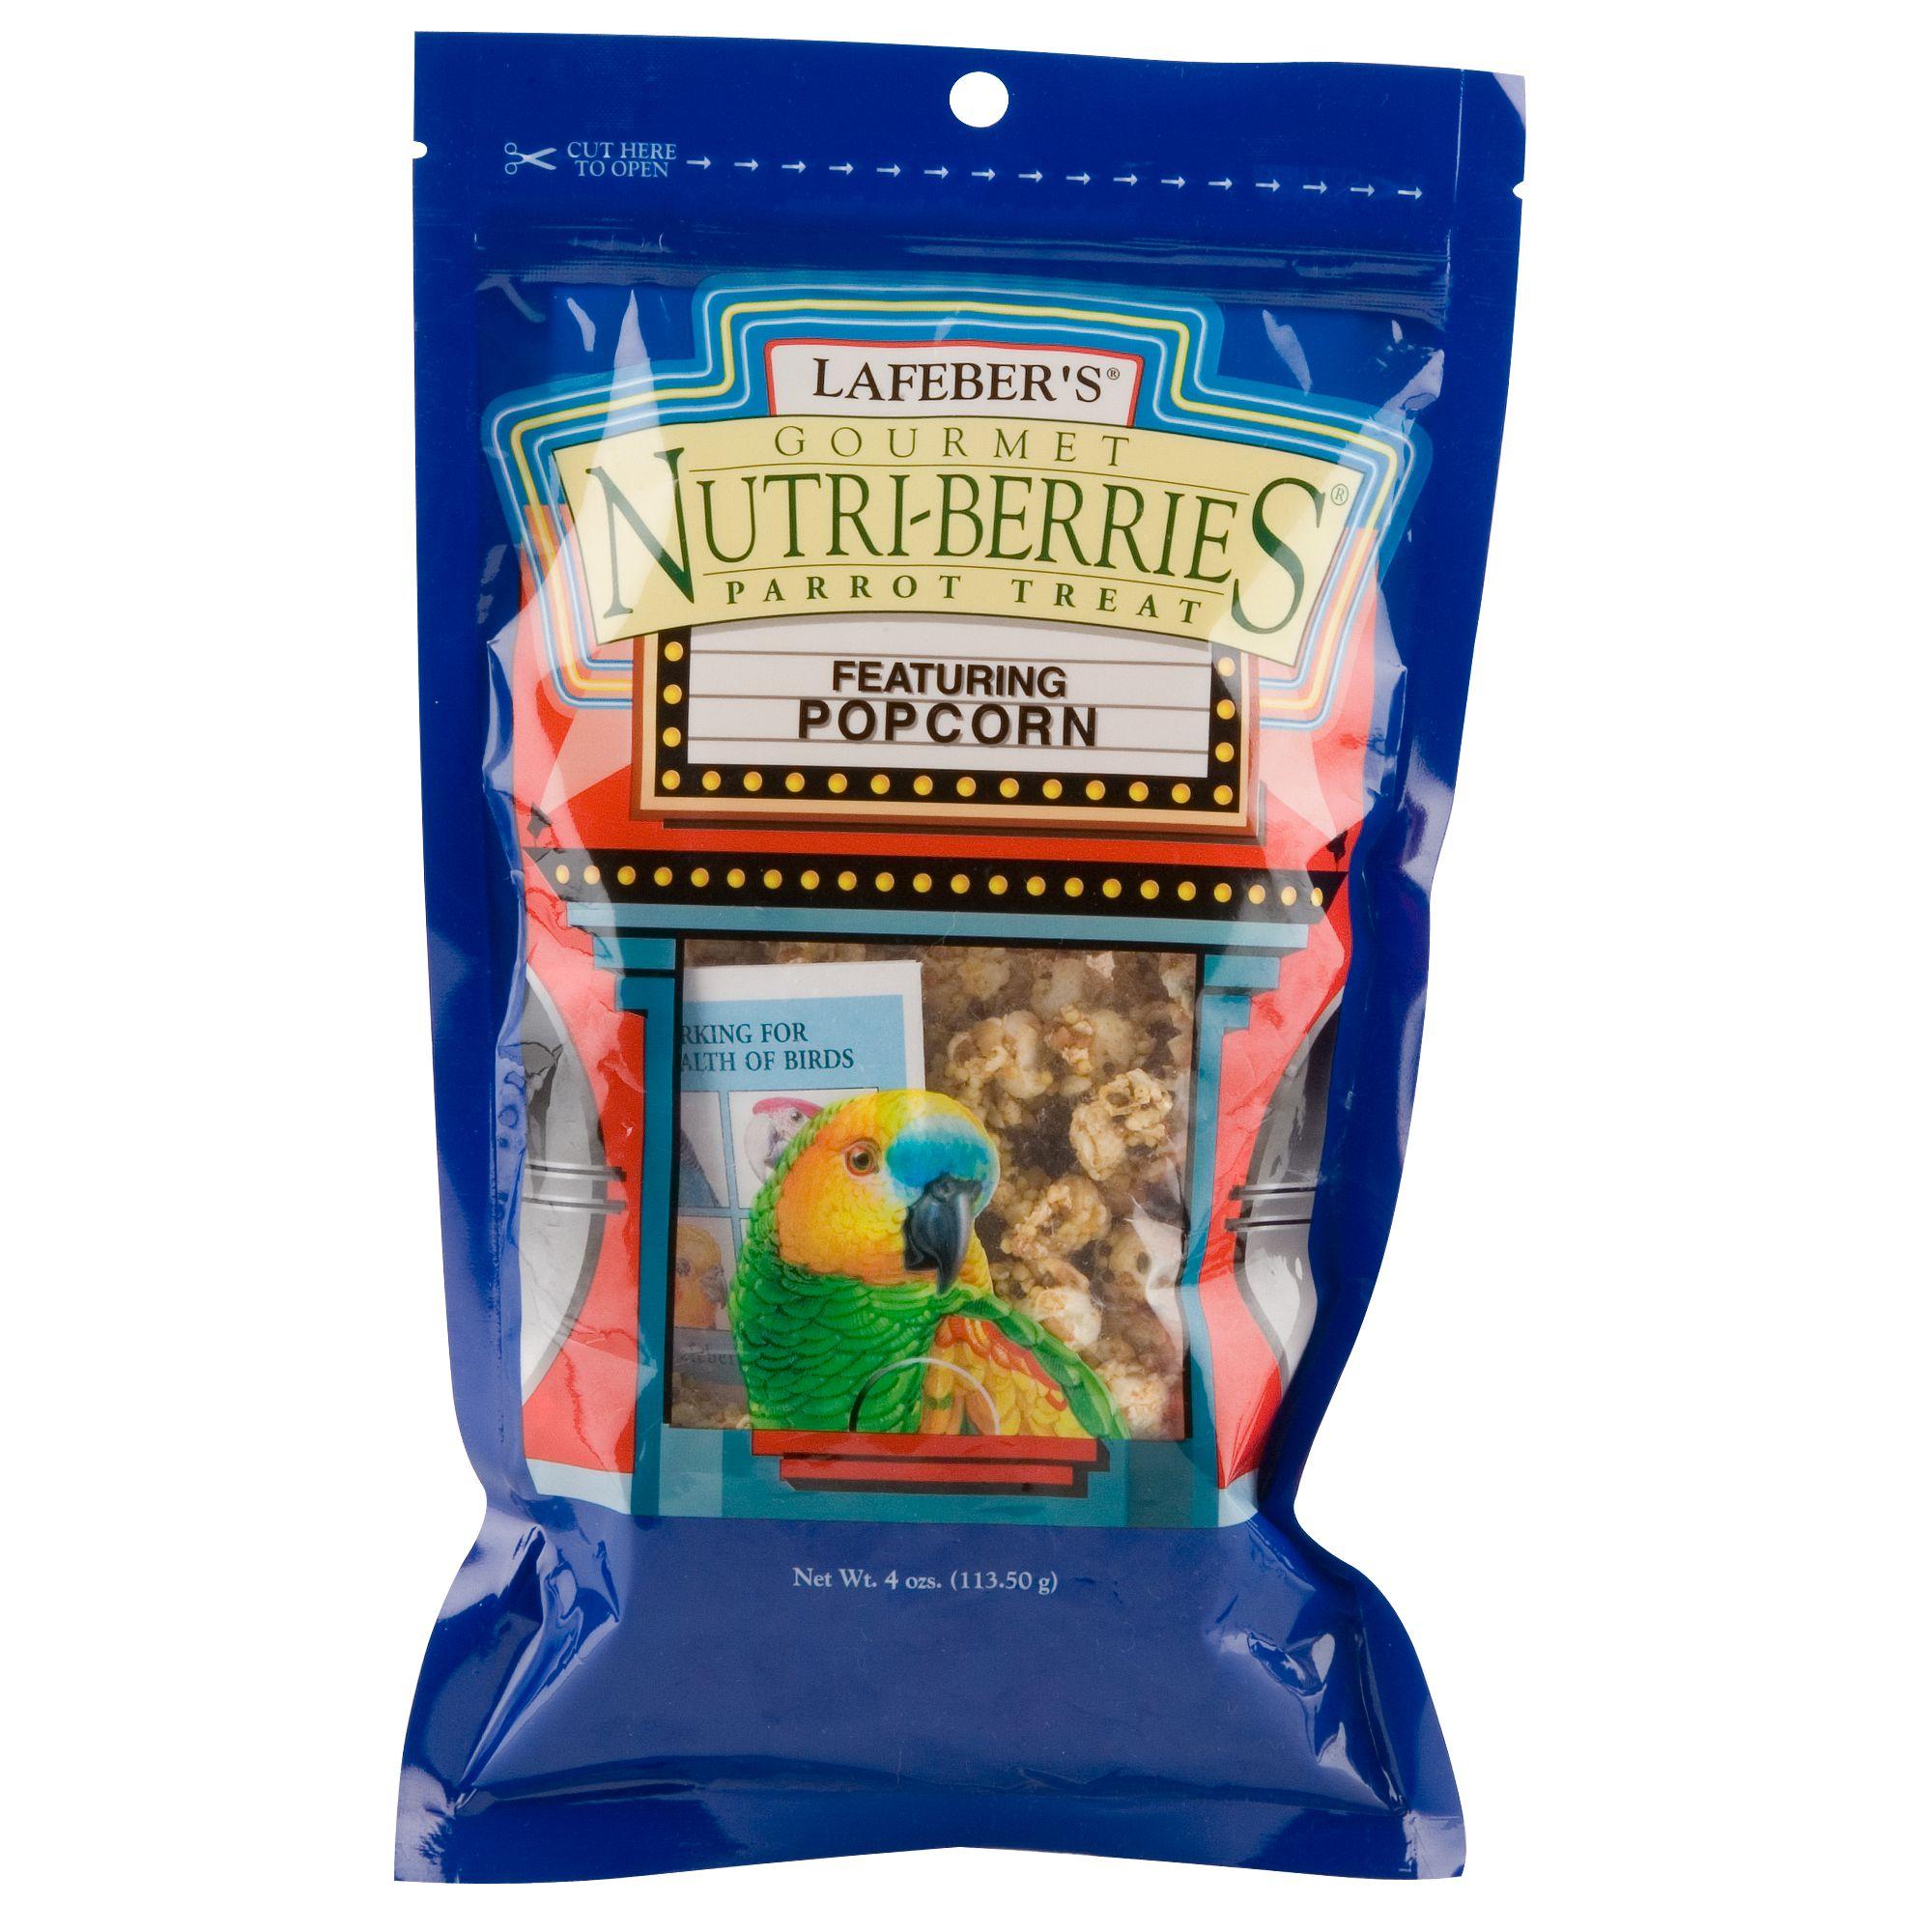 Lafeber's Nutri-Berries Popcorn Parrot Treats size: 4 Oz